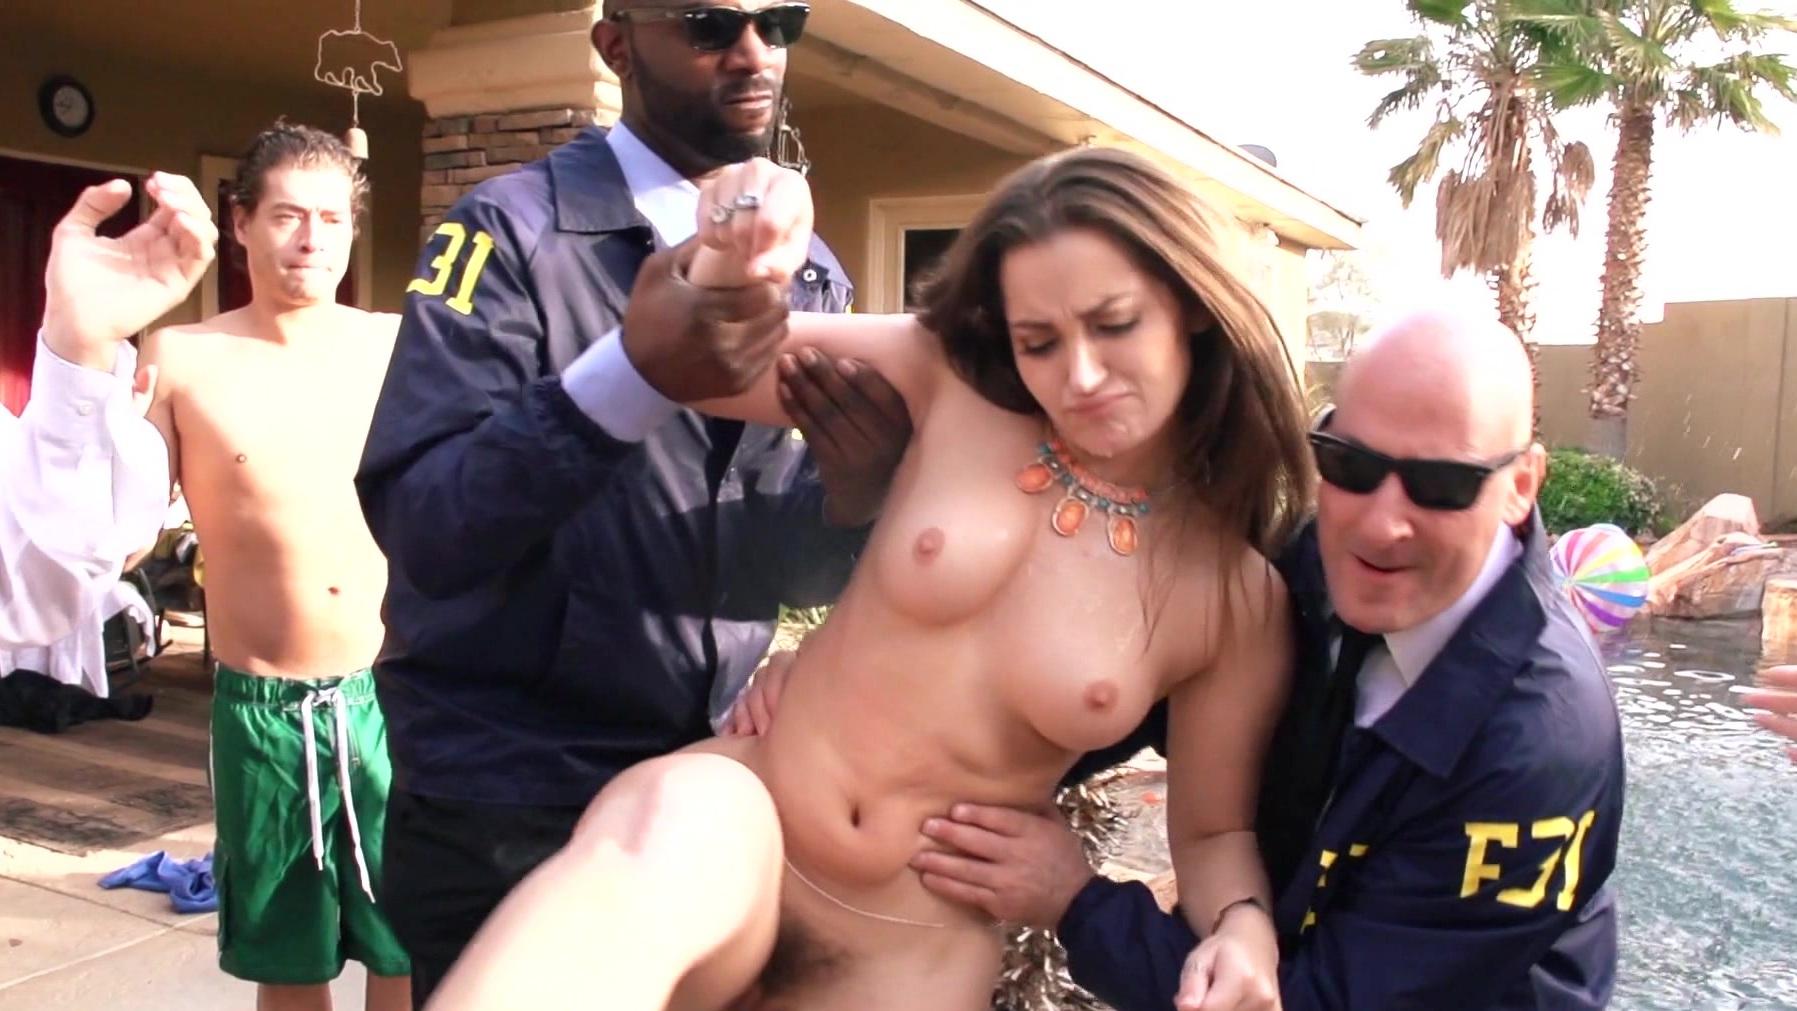 Sex dani daniels Dani Daniels: